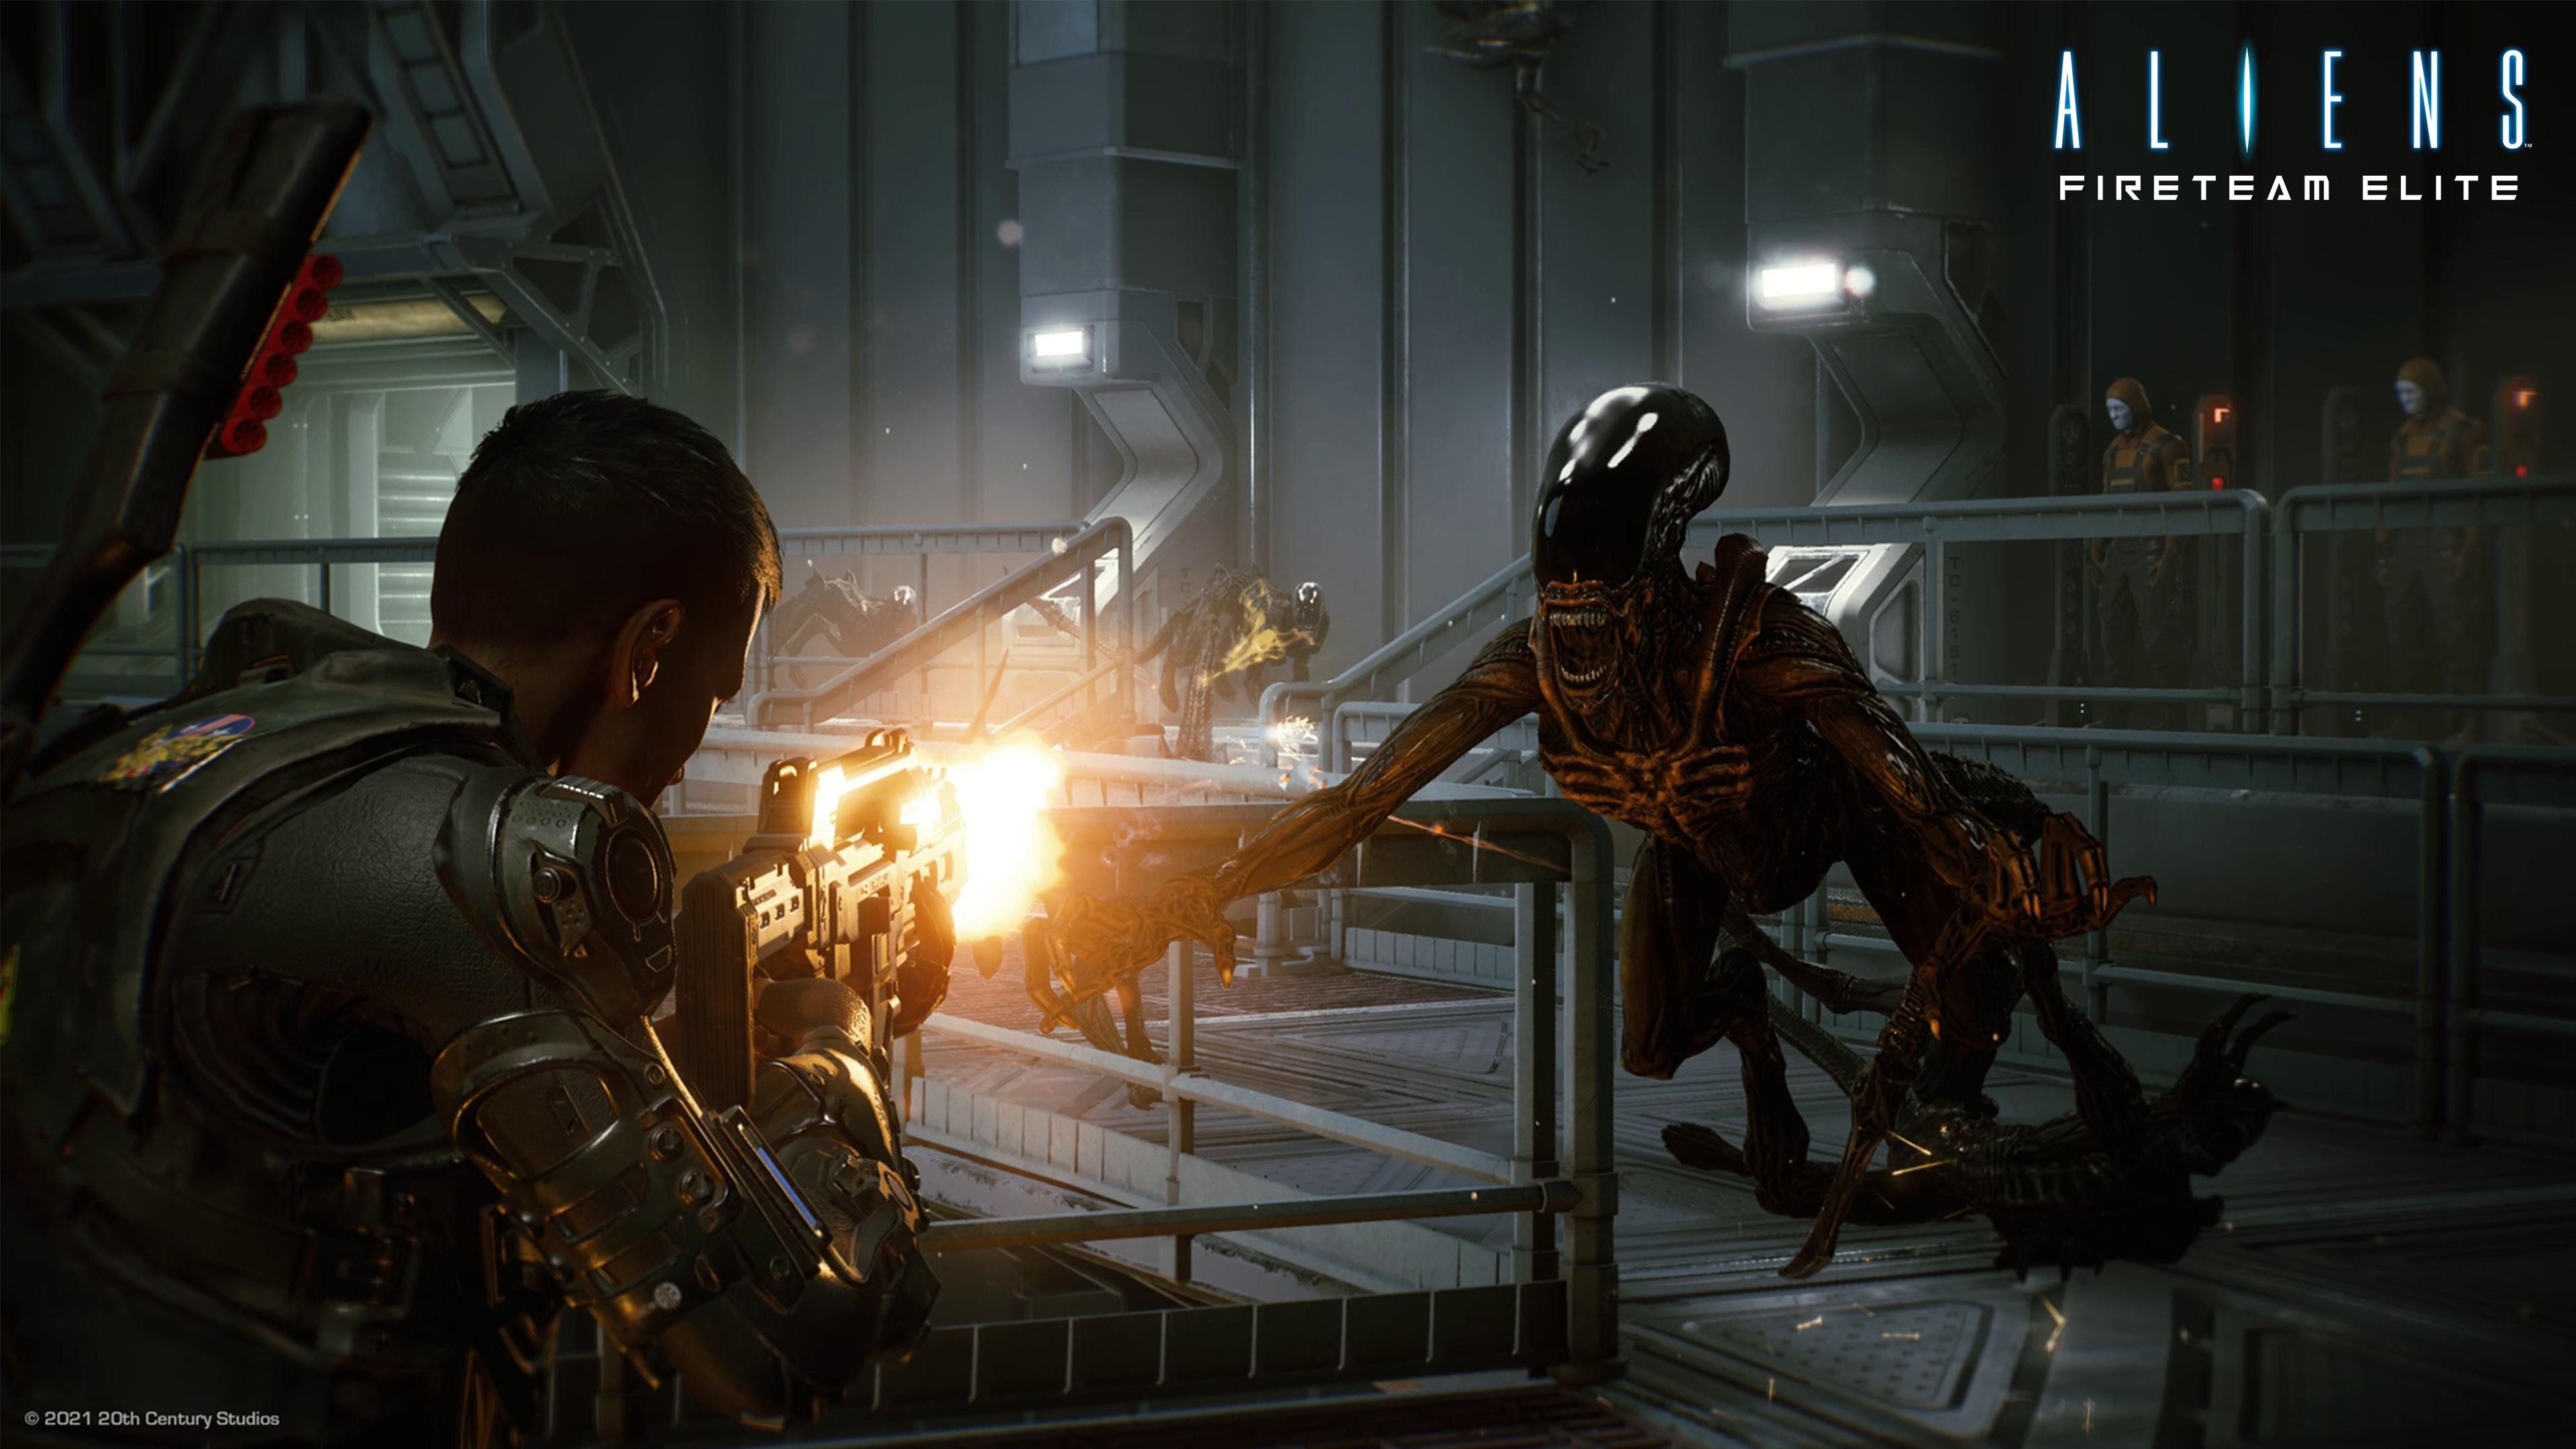 Aliens: Fireteam Elite | EMEA (c20f855c-03d2-4c9f-b966-41445a737a58)